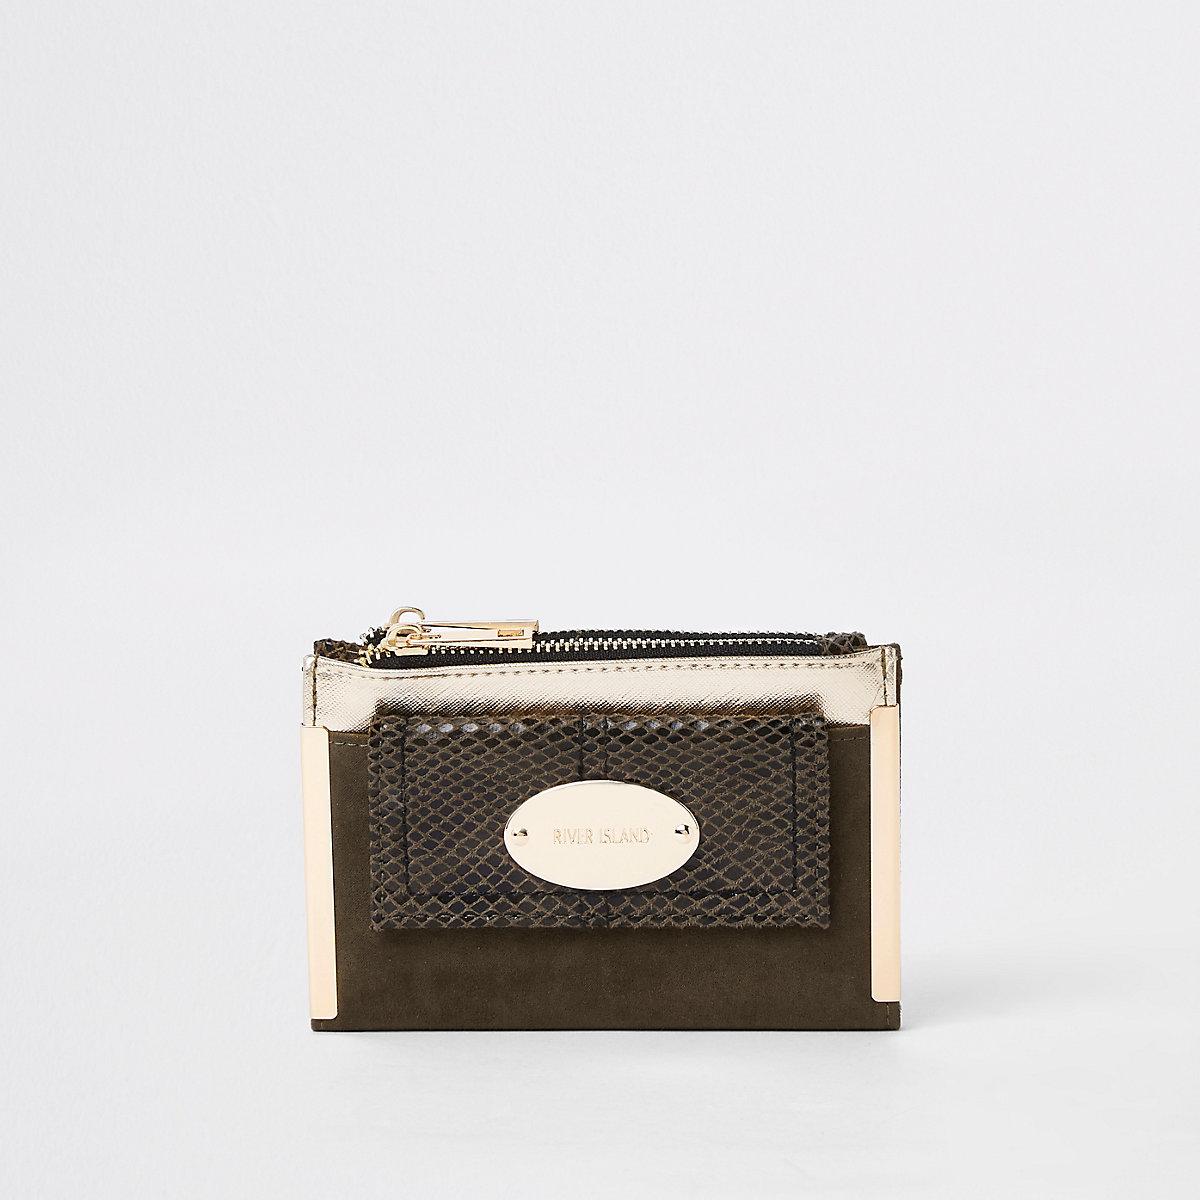 Khaki front pocket mini foldout purse